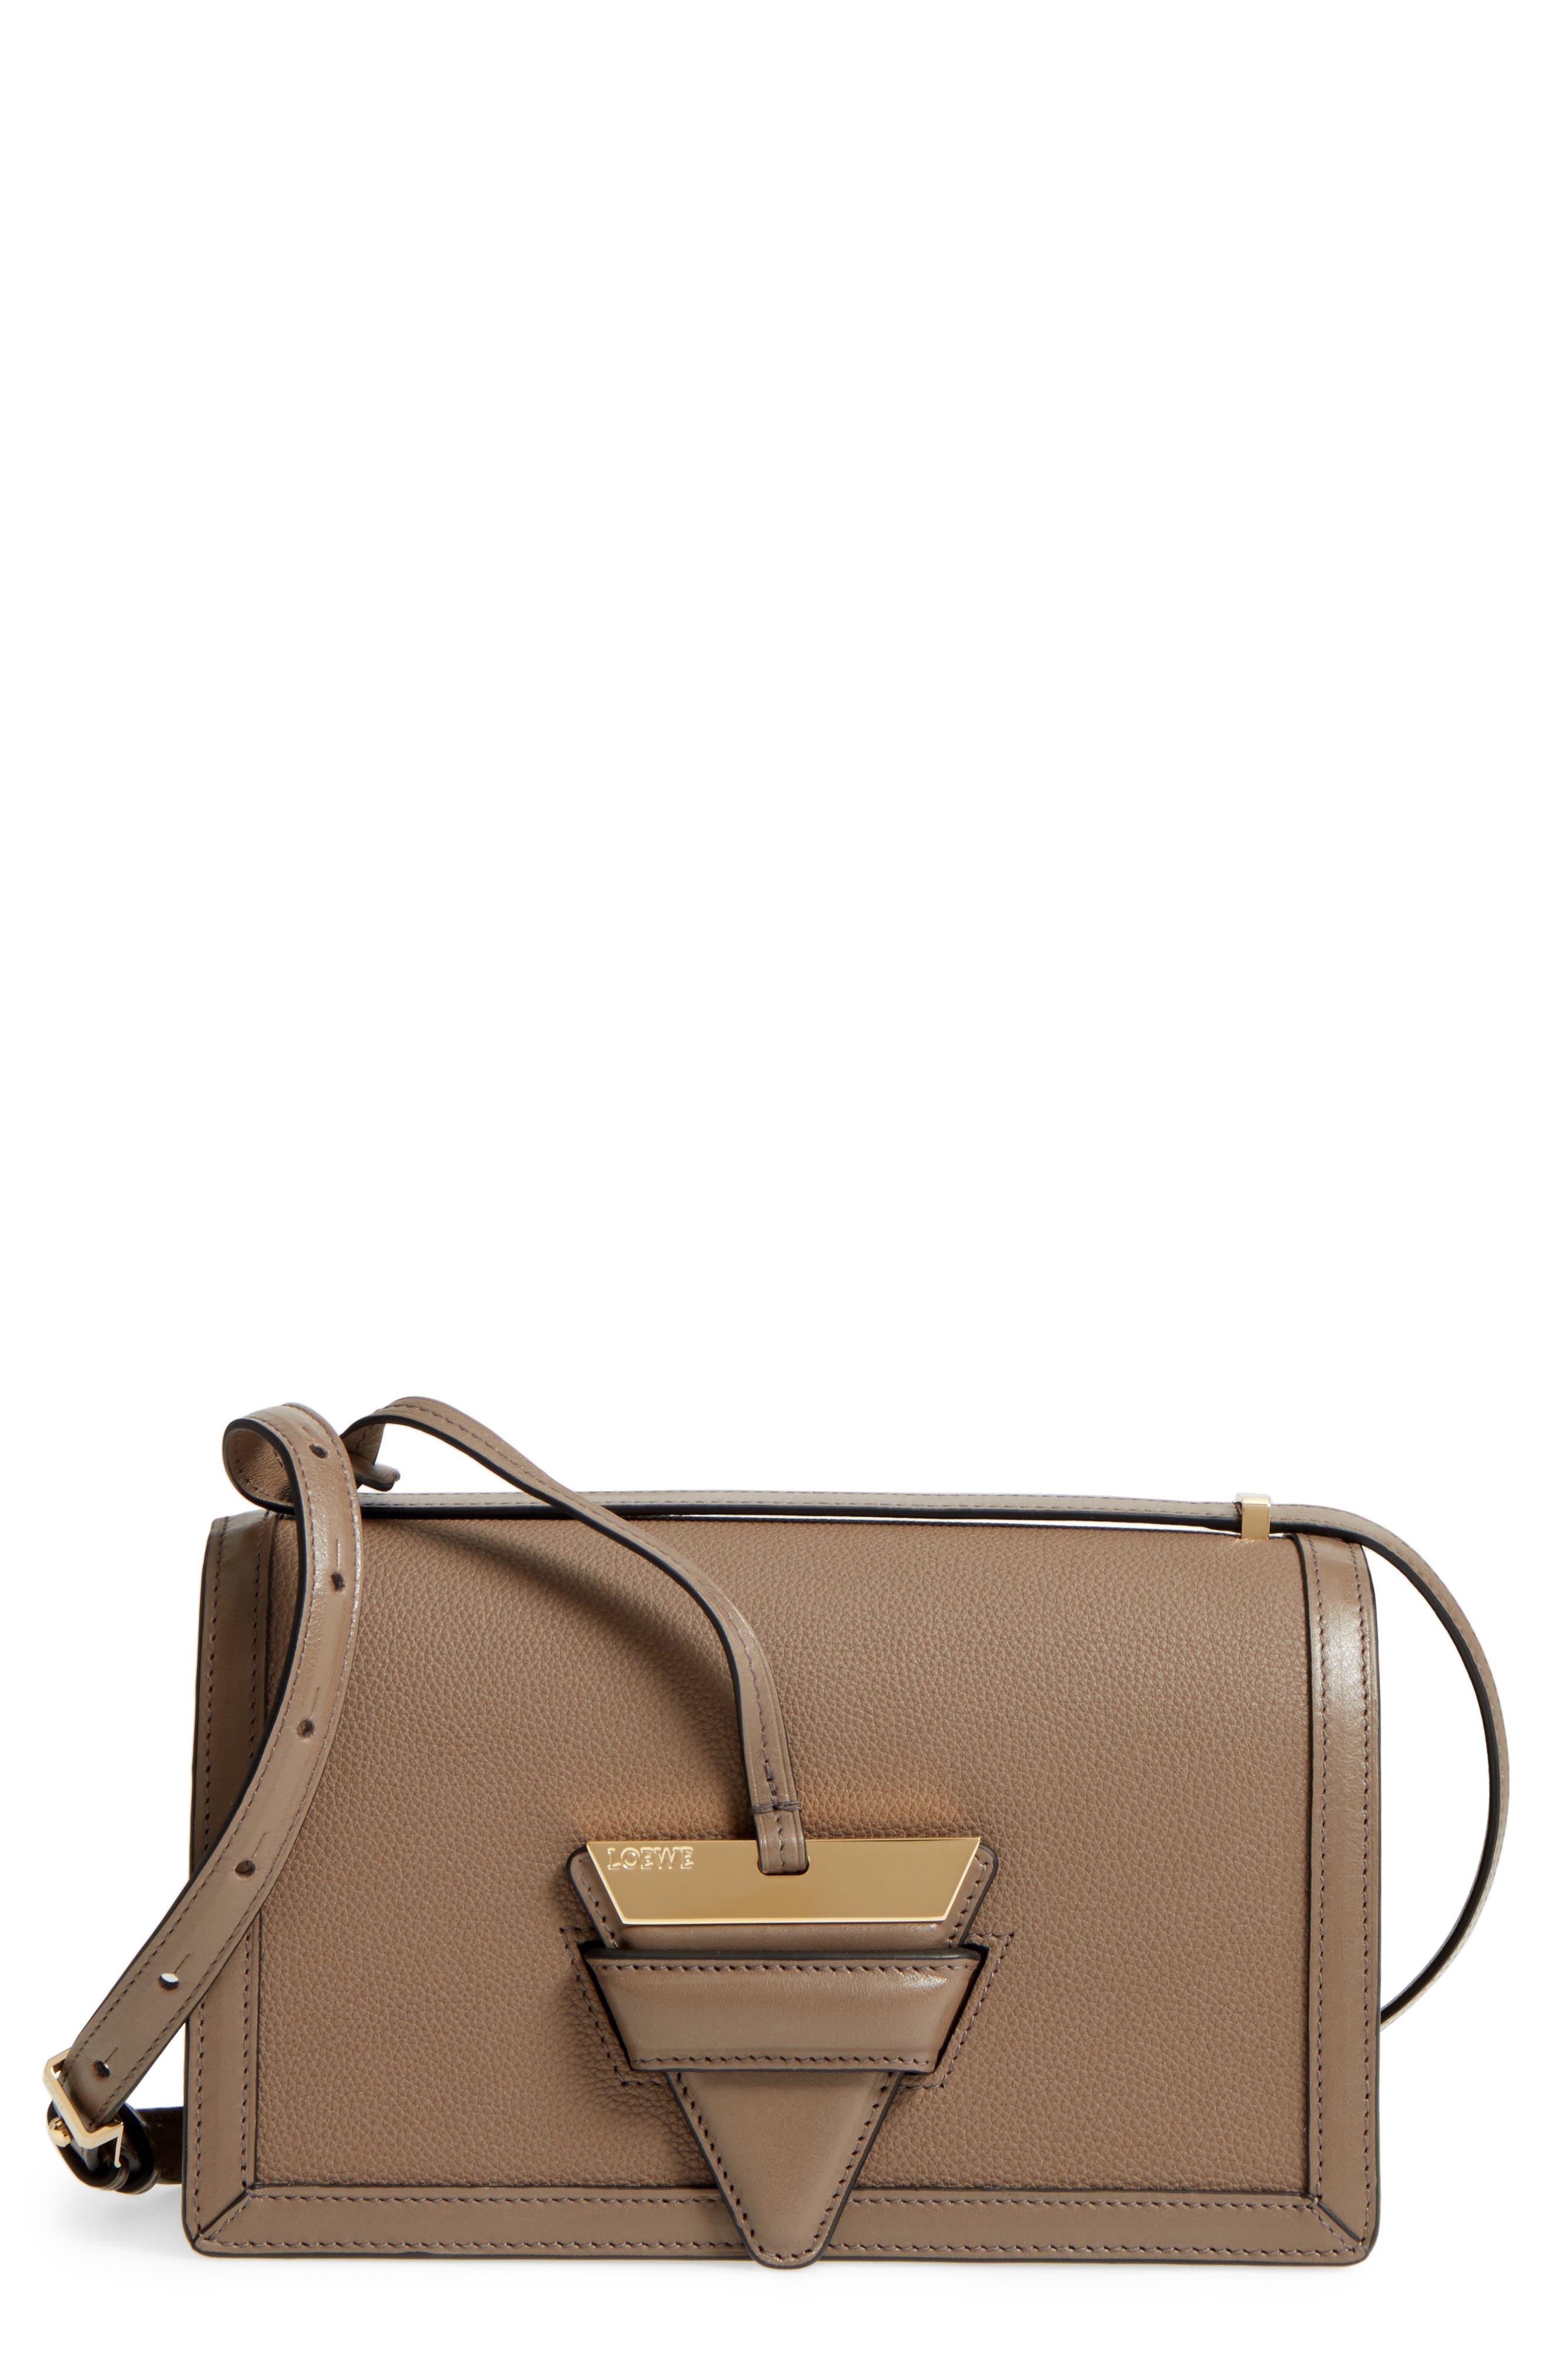 Medium Barcelona Leather Crossbody Bag,                         Main,                         color,